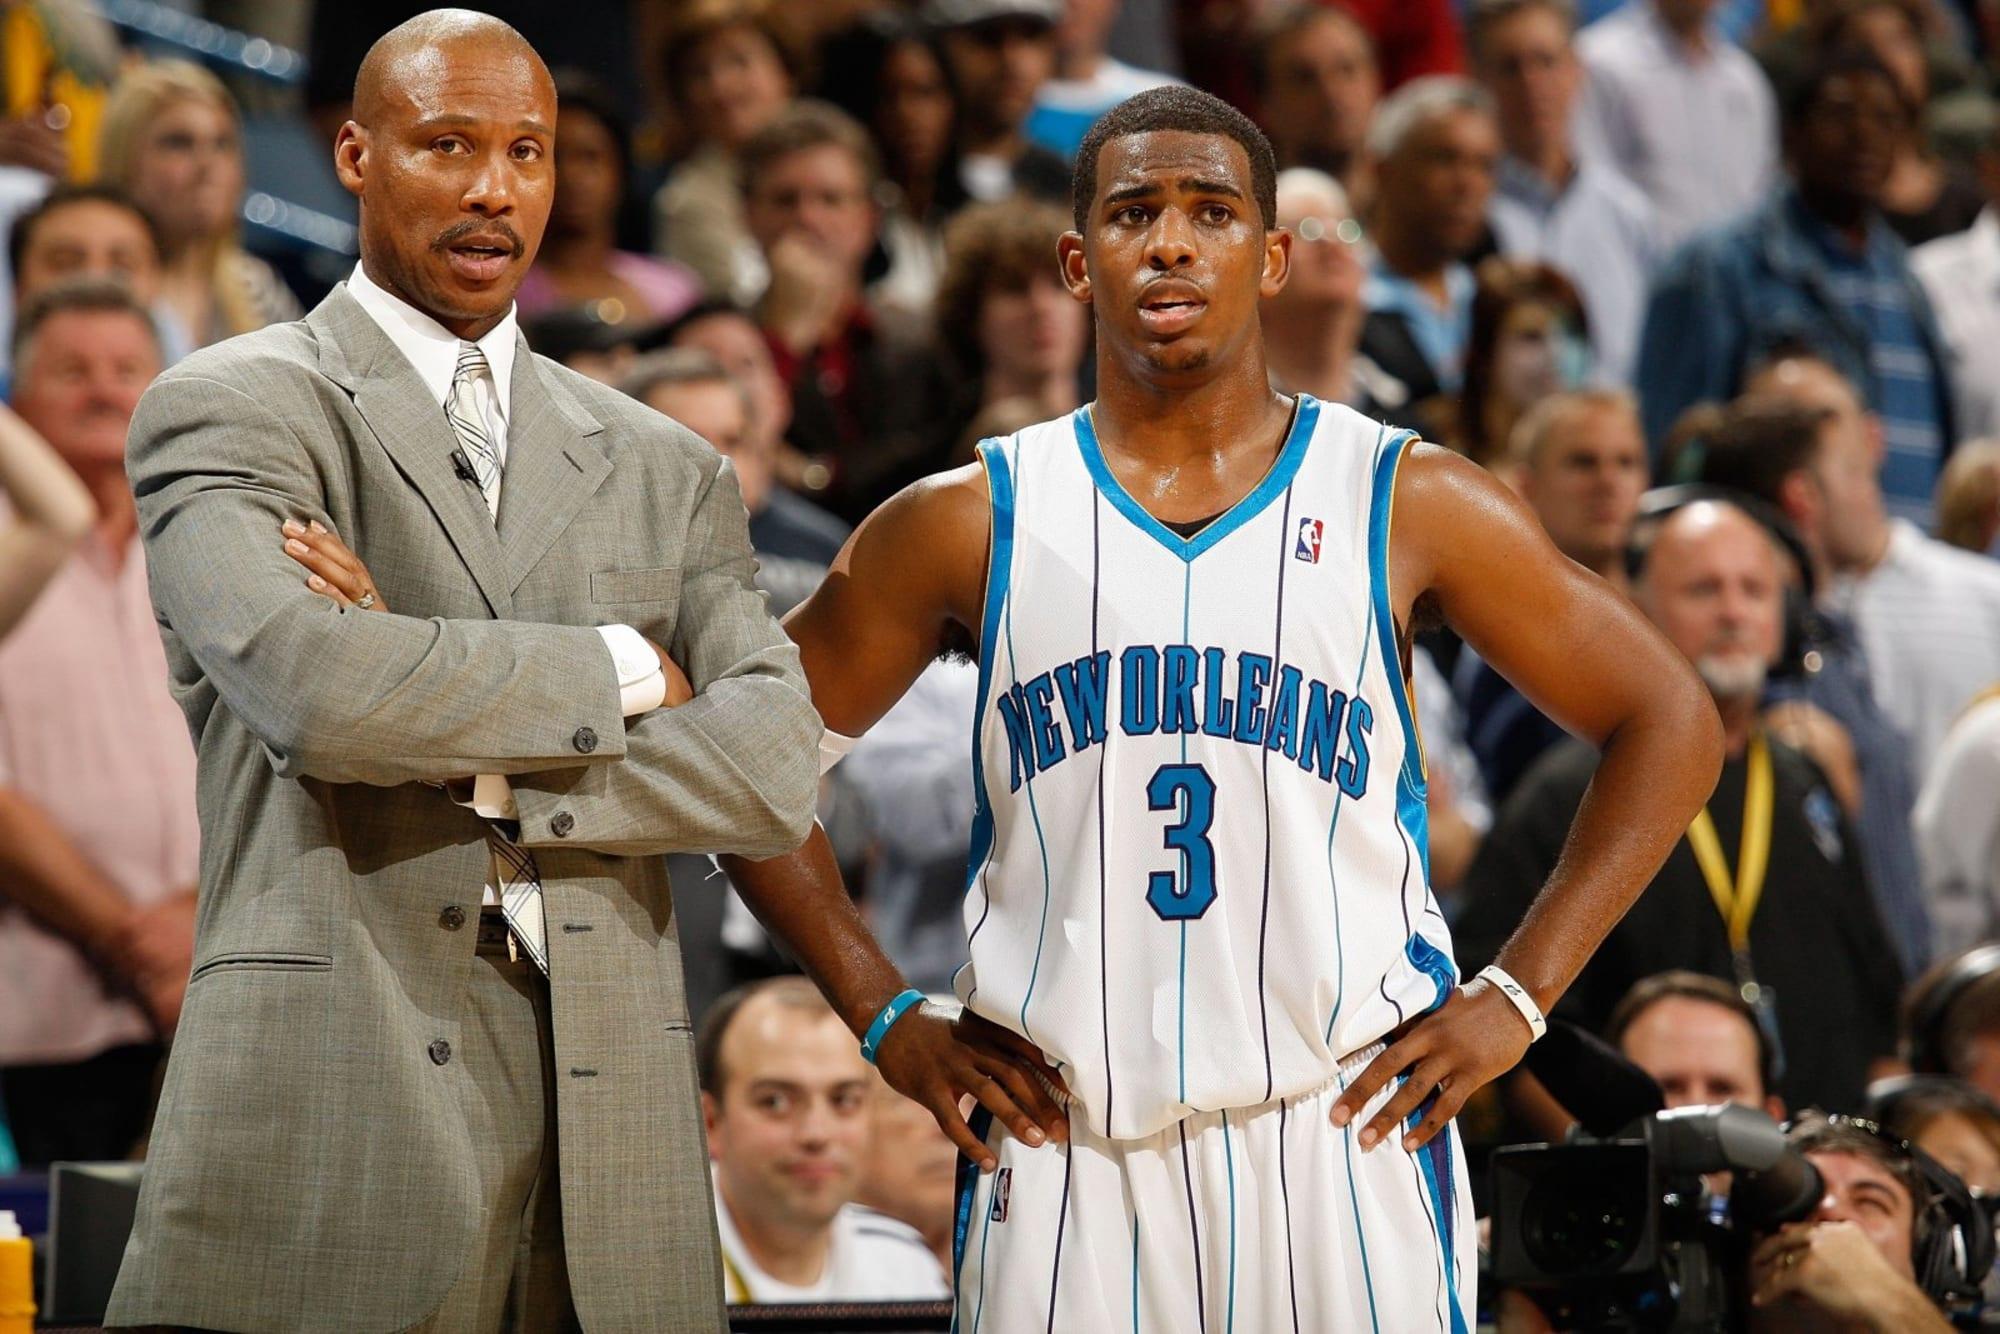 Pelicans: Pre-draft, Byron Scott took prospect Chris Paul to… TGI Fridays?